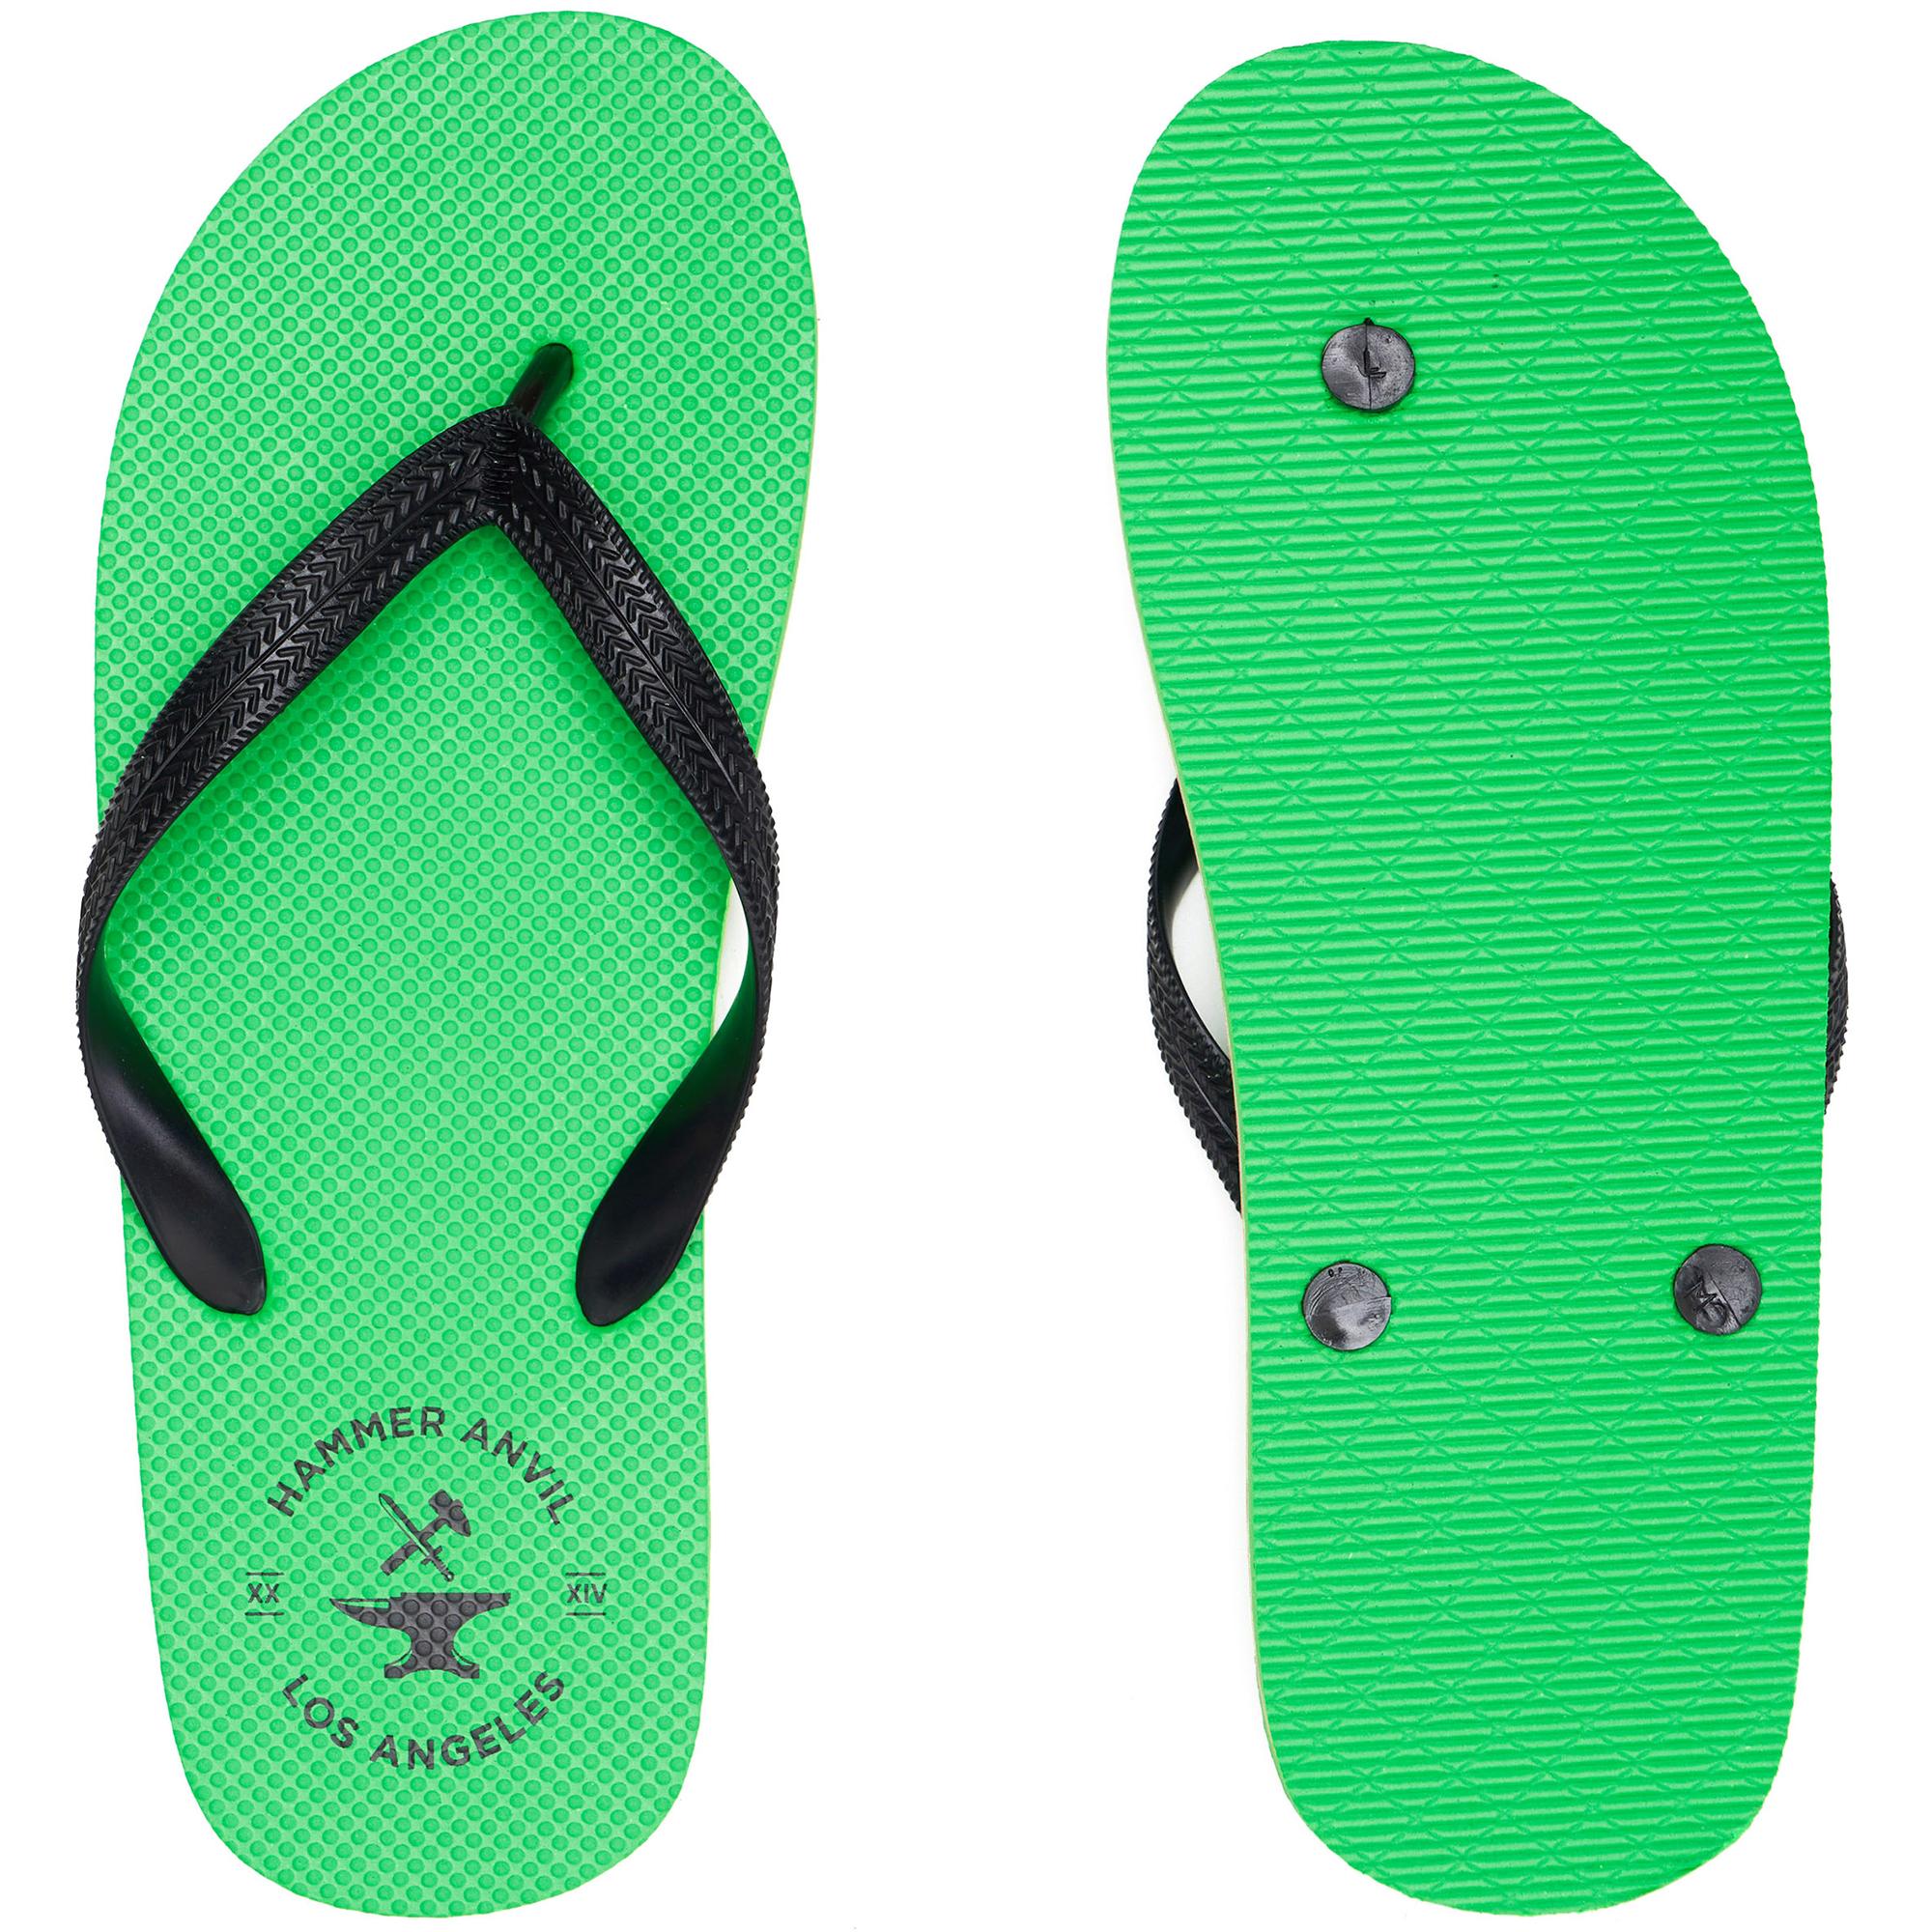 Hammer-Anvil-Mens-Flip-Flops-Casual-Thong-Summer-Sandals-Comfortable-Beach-Shoes thumbnail 23